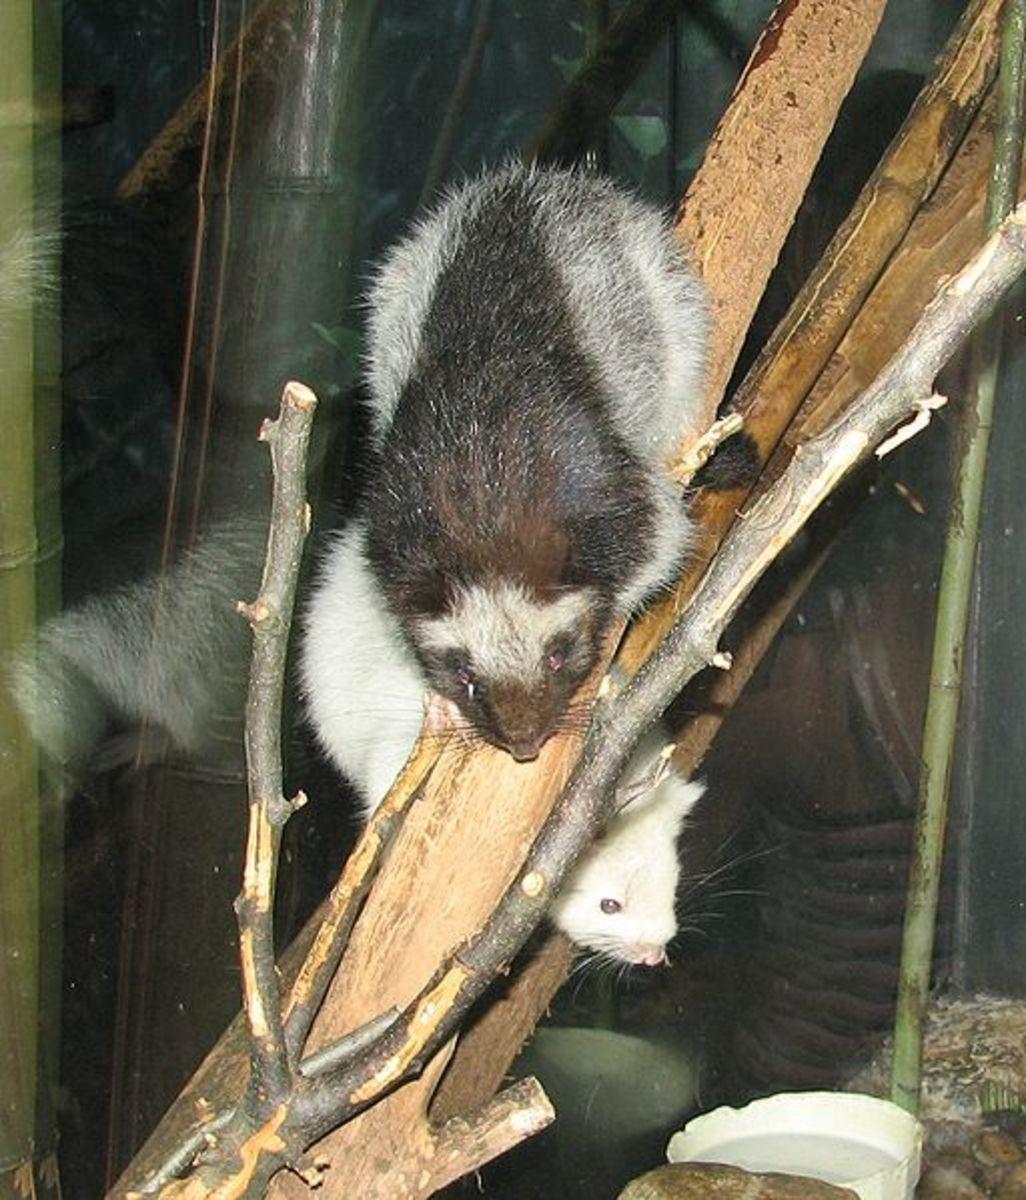 Dinagat Bushy-Tailed Cloud Rat (Crateromys australis)